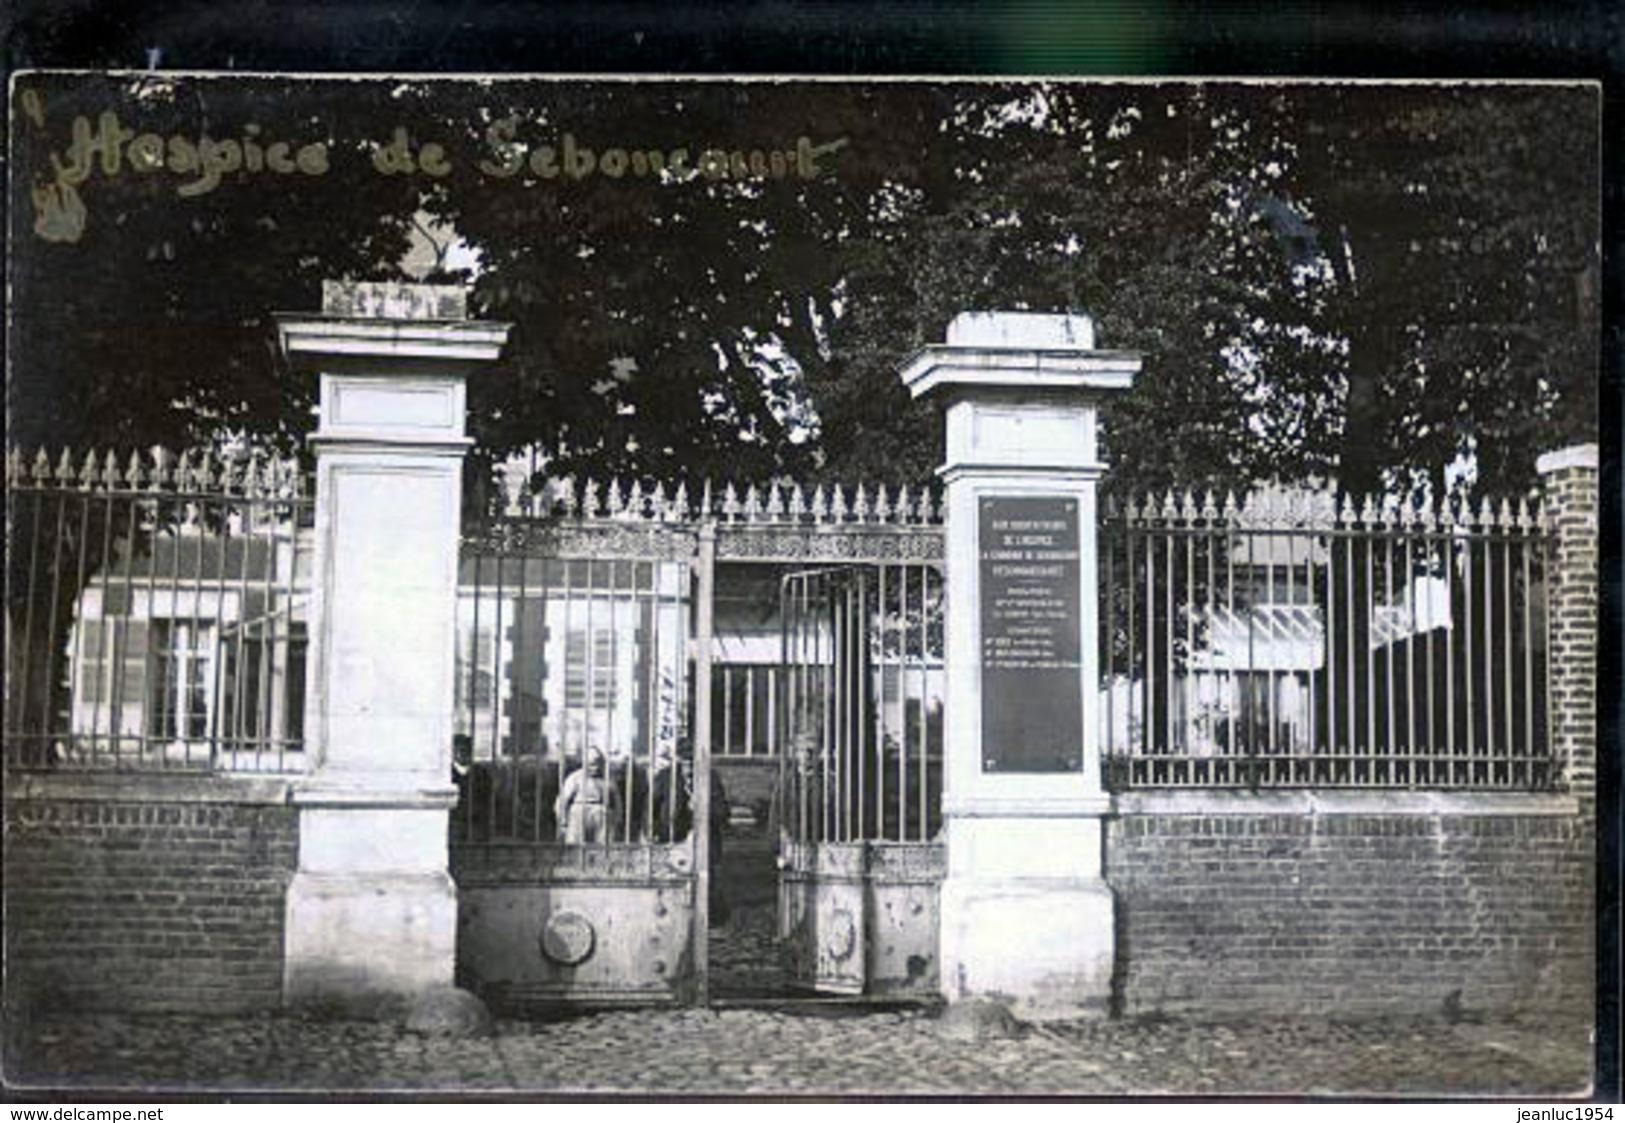 SEBONCOURT HOSPICE PHOTO CARTE - Francia